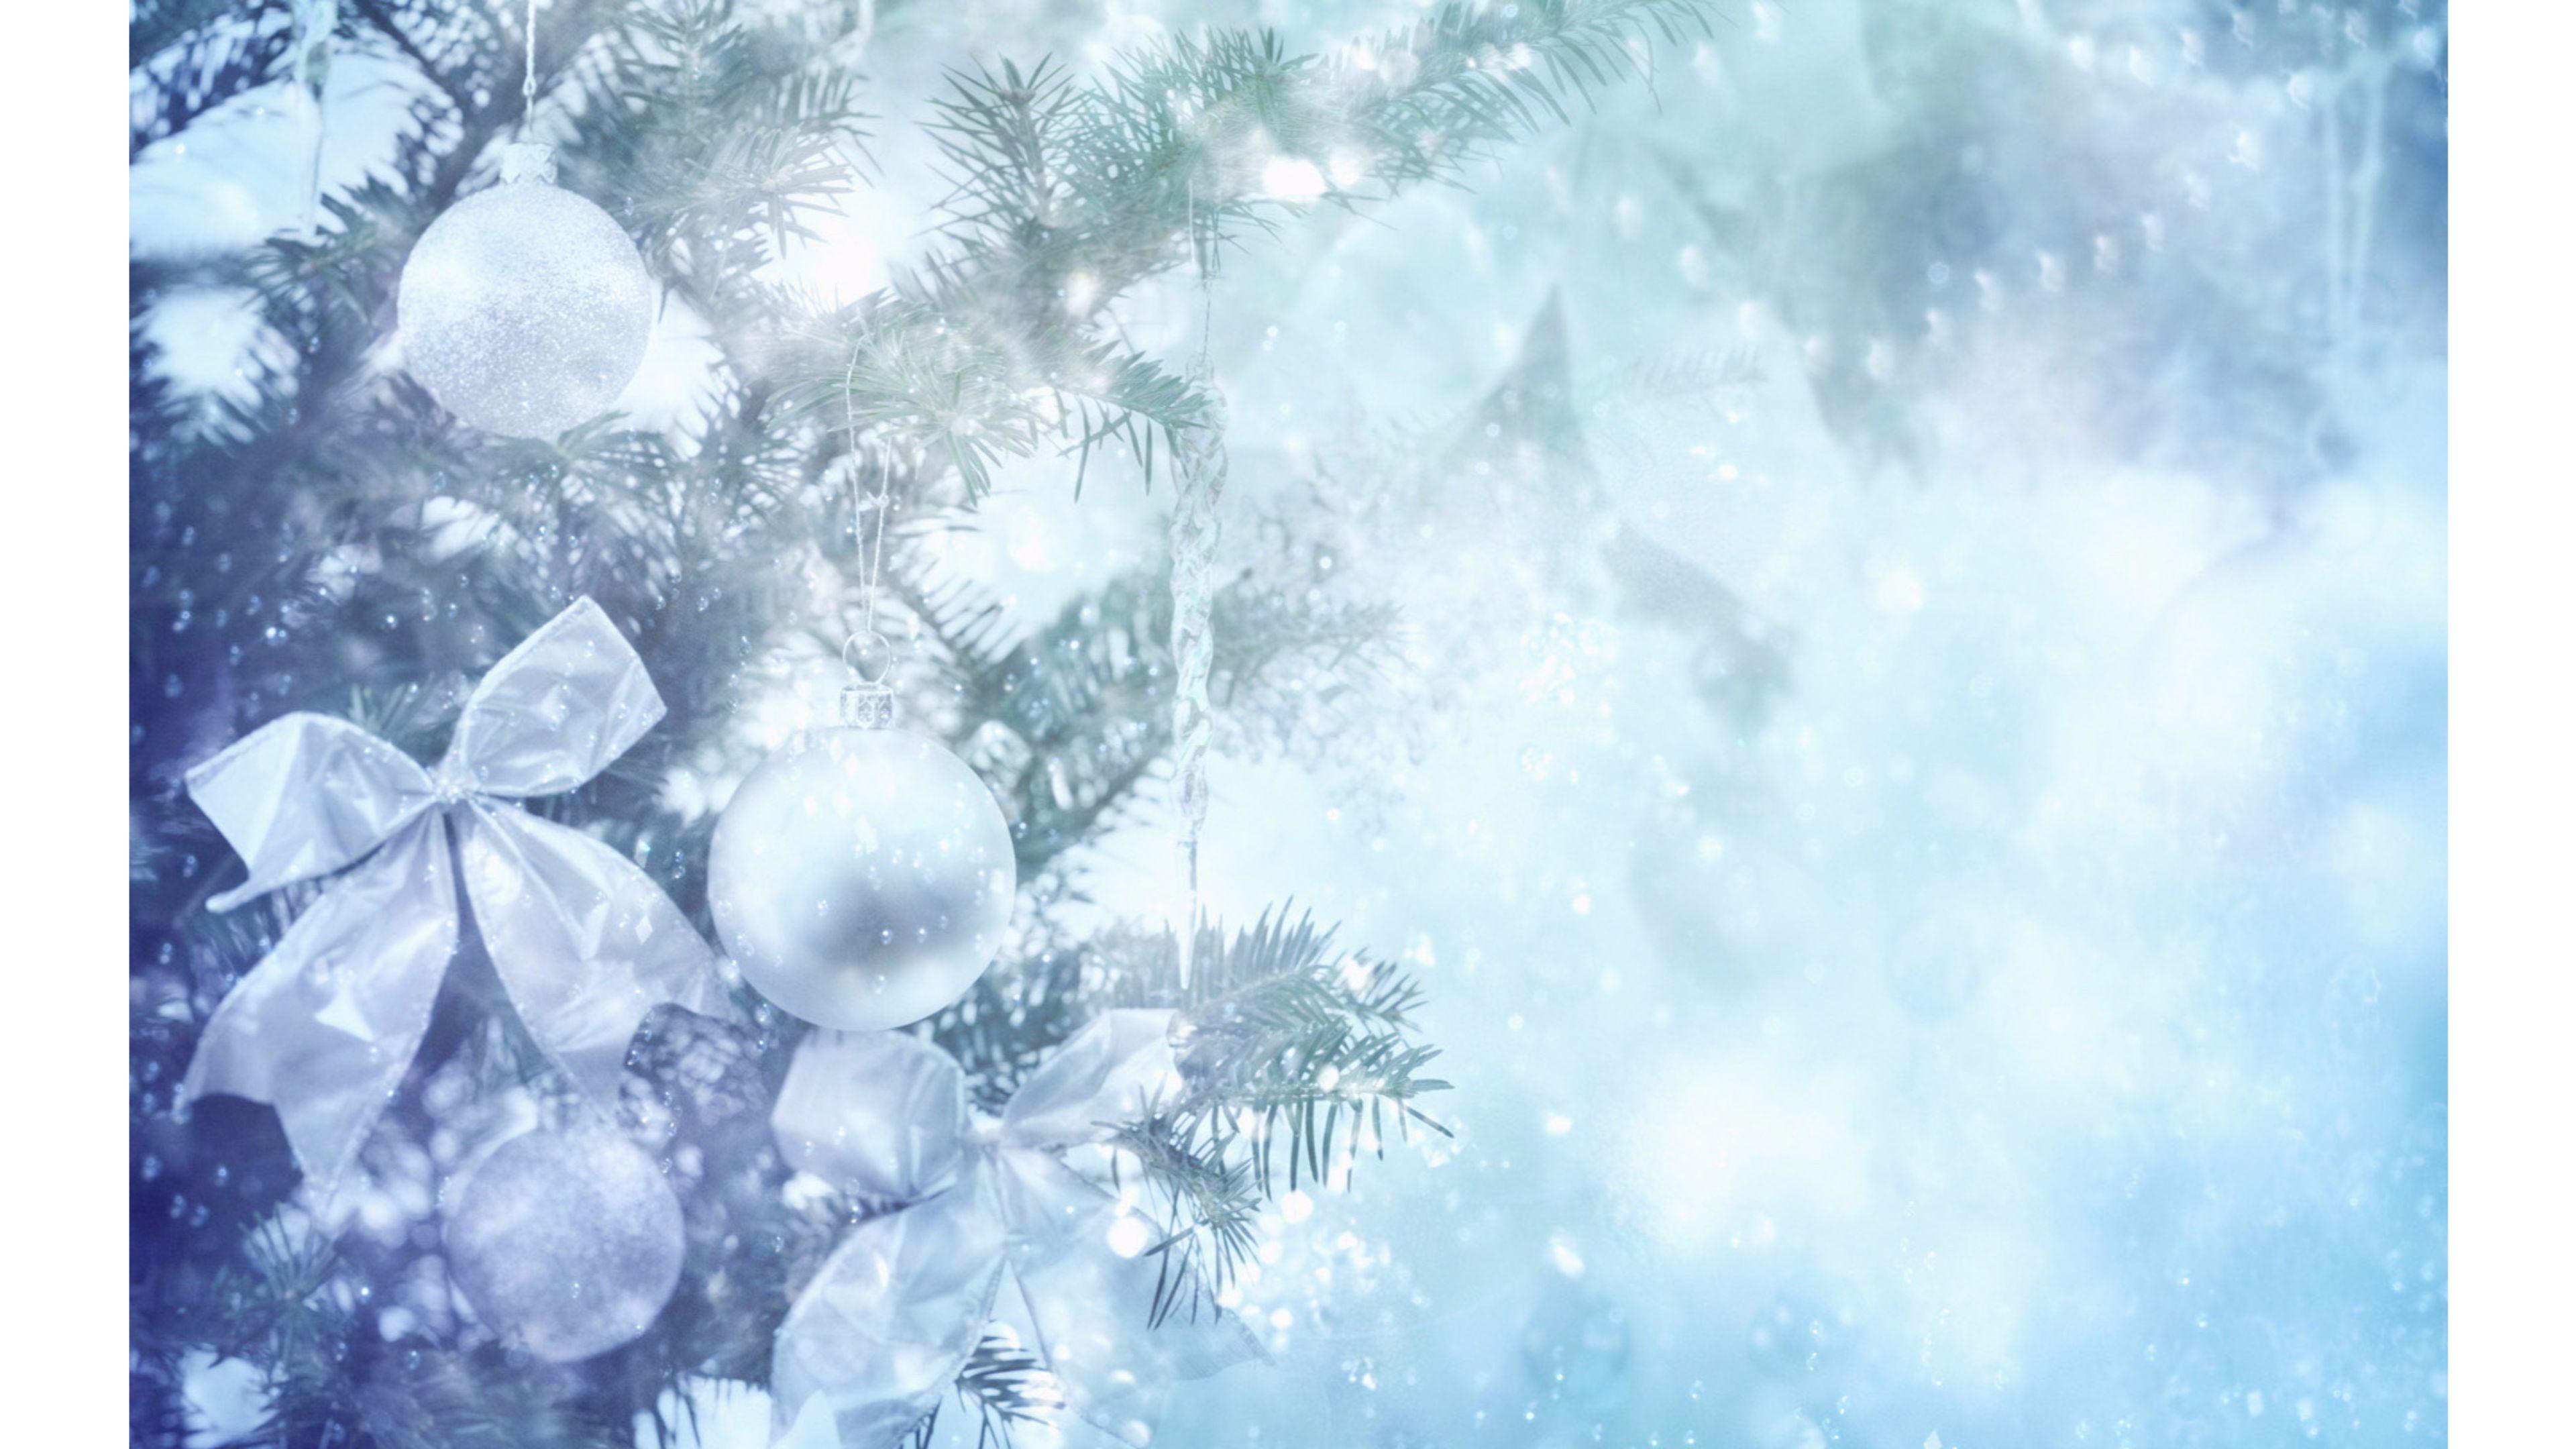 vintage christmas tree 4k winter wallpaper